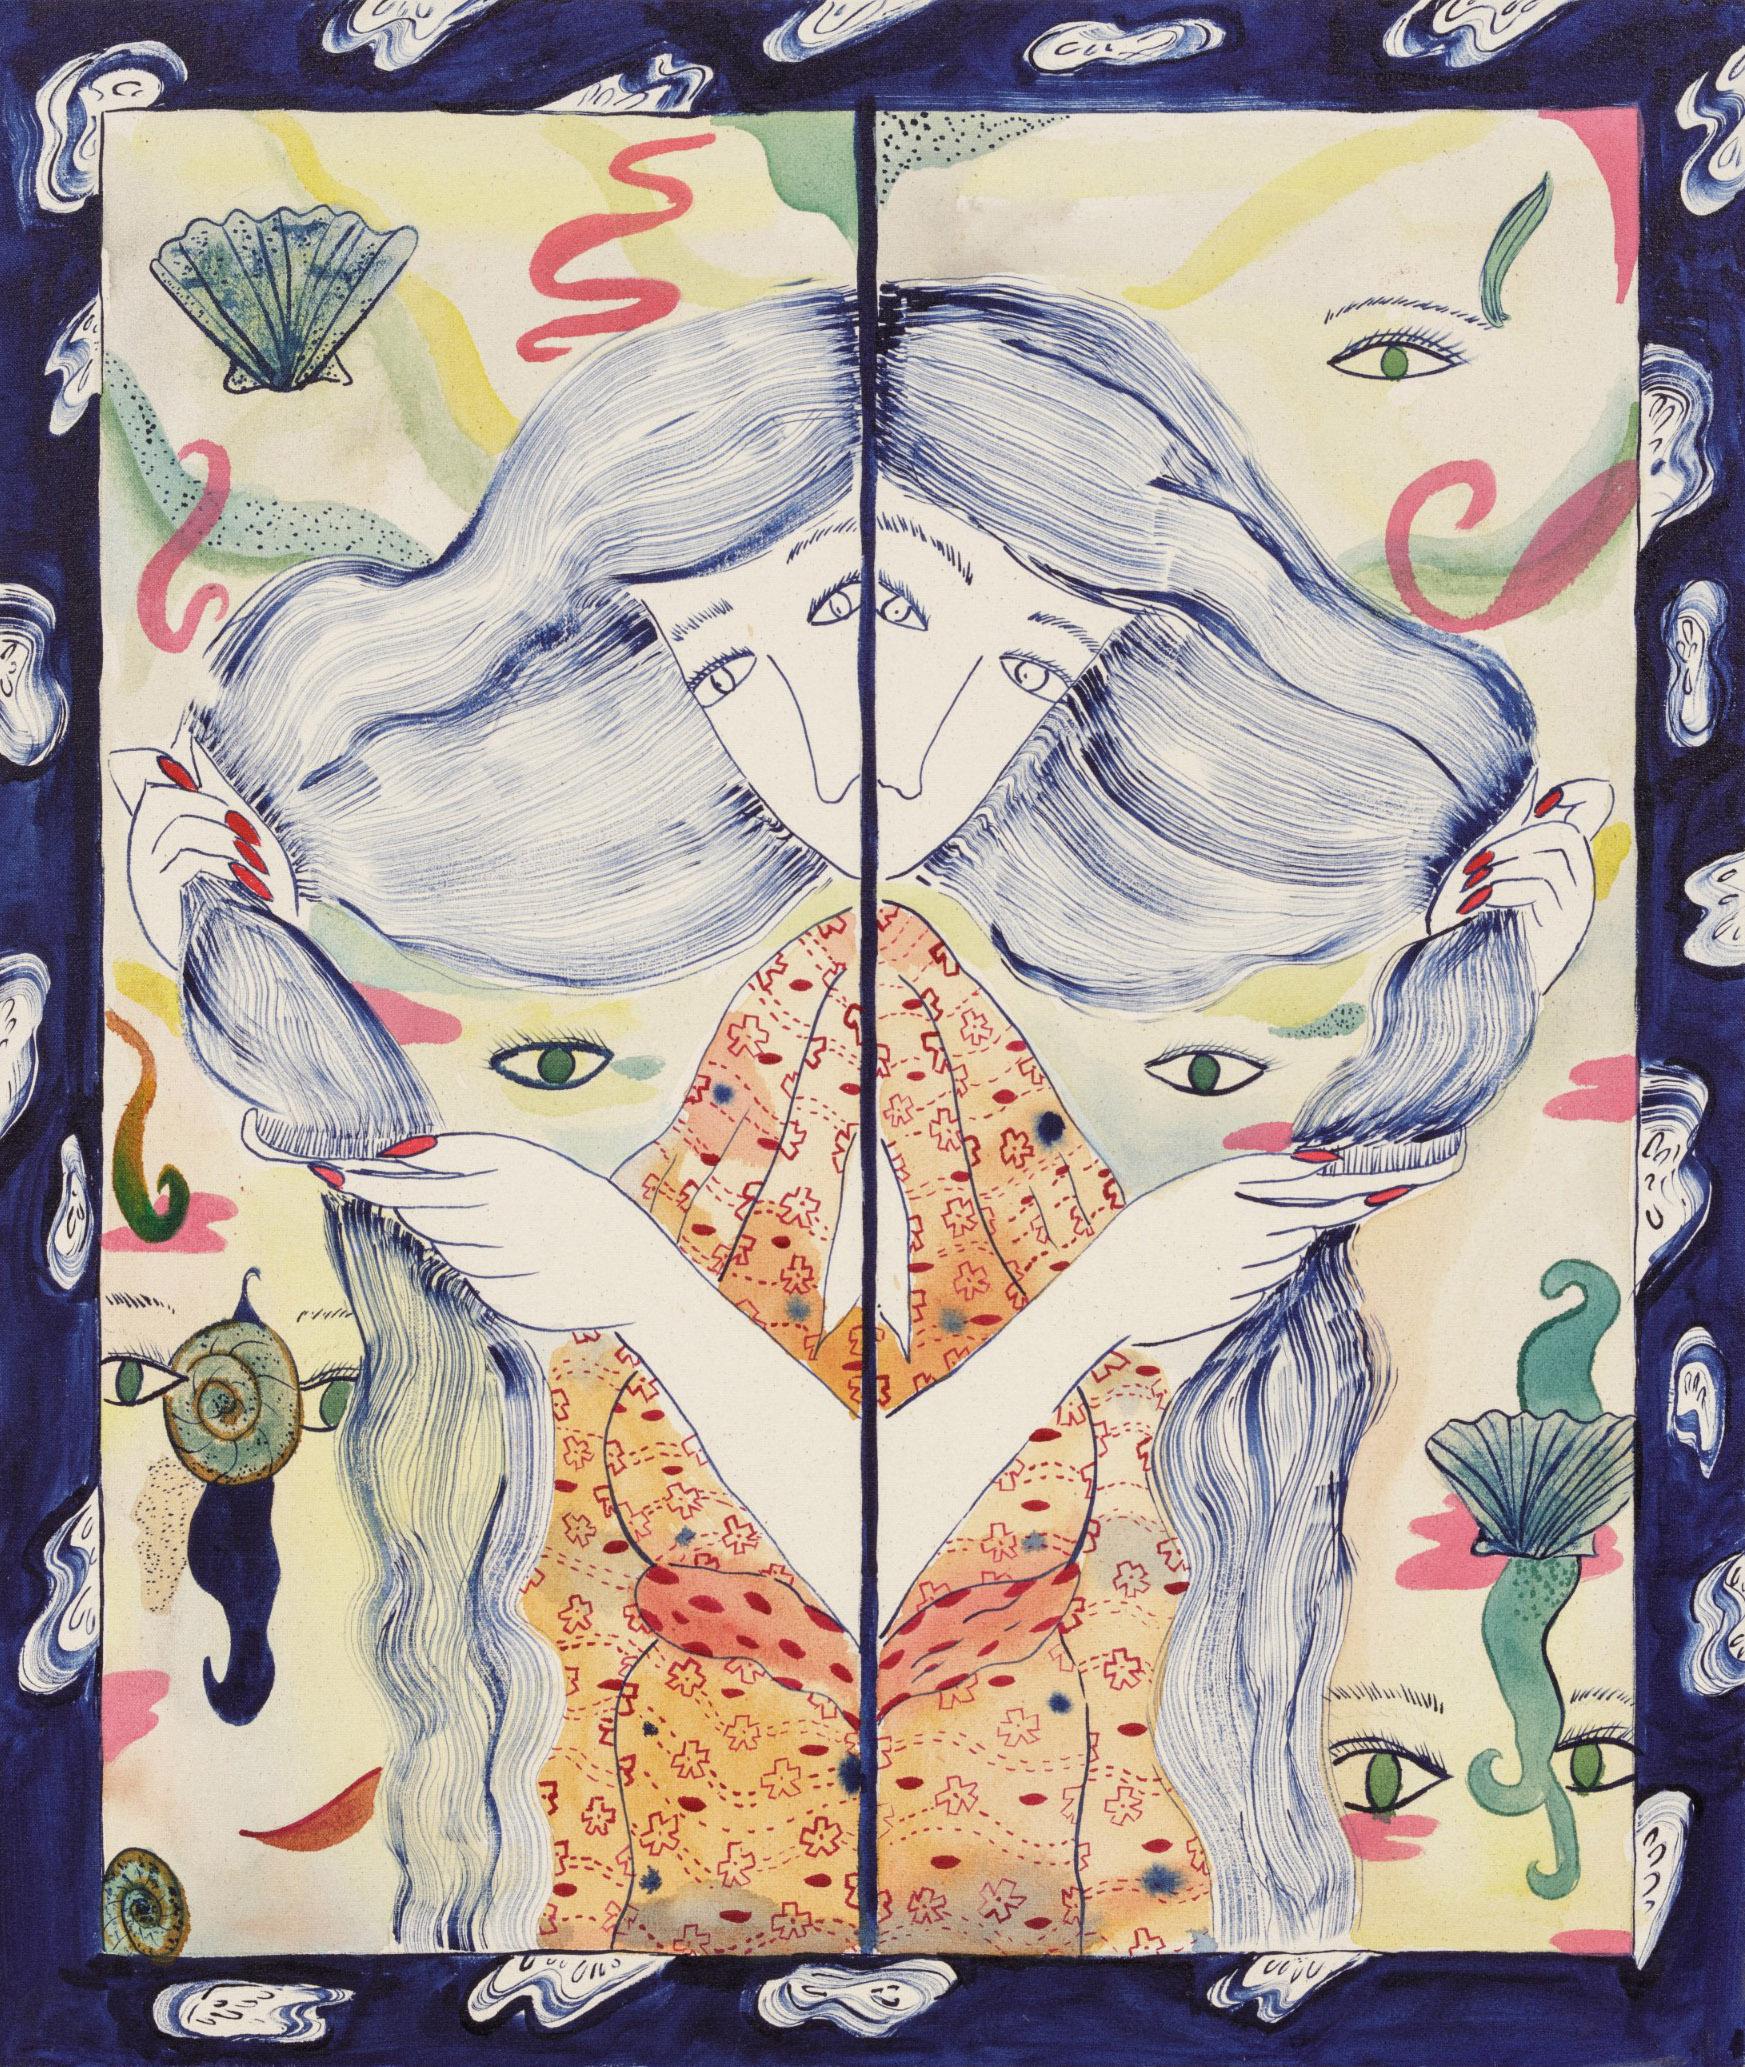 Jamie Felton. <em>Combing Mirror</em>, 2018. Ink on canvas, 30 1/4 x 25 3/4 inches (76.8 x 65.4 cm)